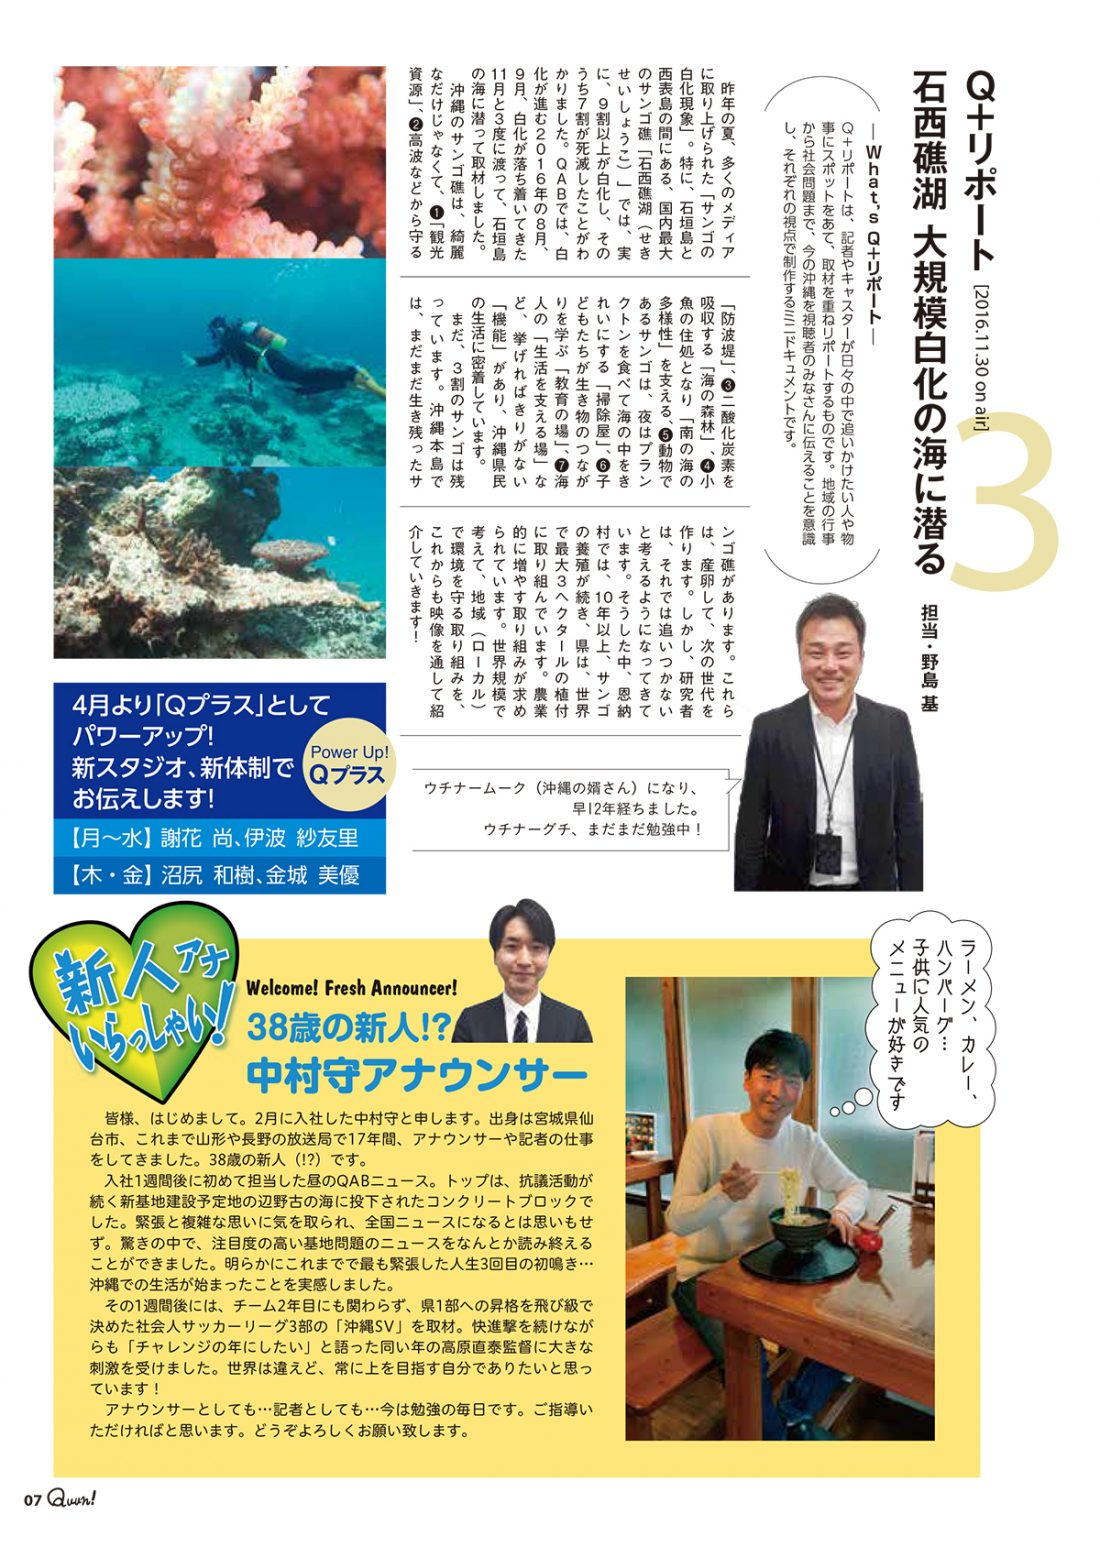 https://www.qab.co.jp/qgoro/wp-content/uploads/quun_0709-1100x1558.jpg